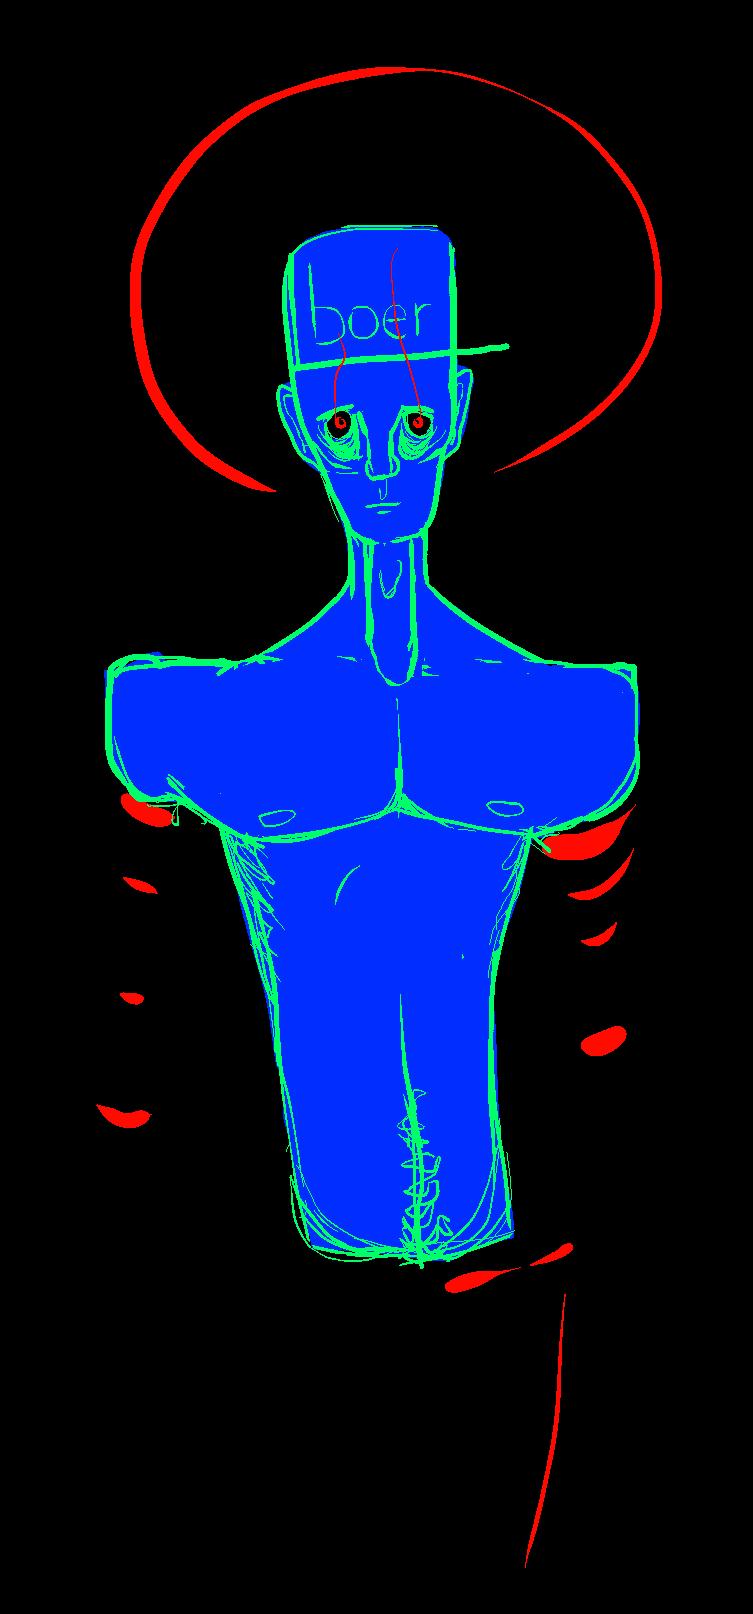 Human Body Parts by VEZONISME